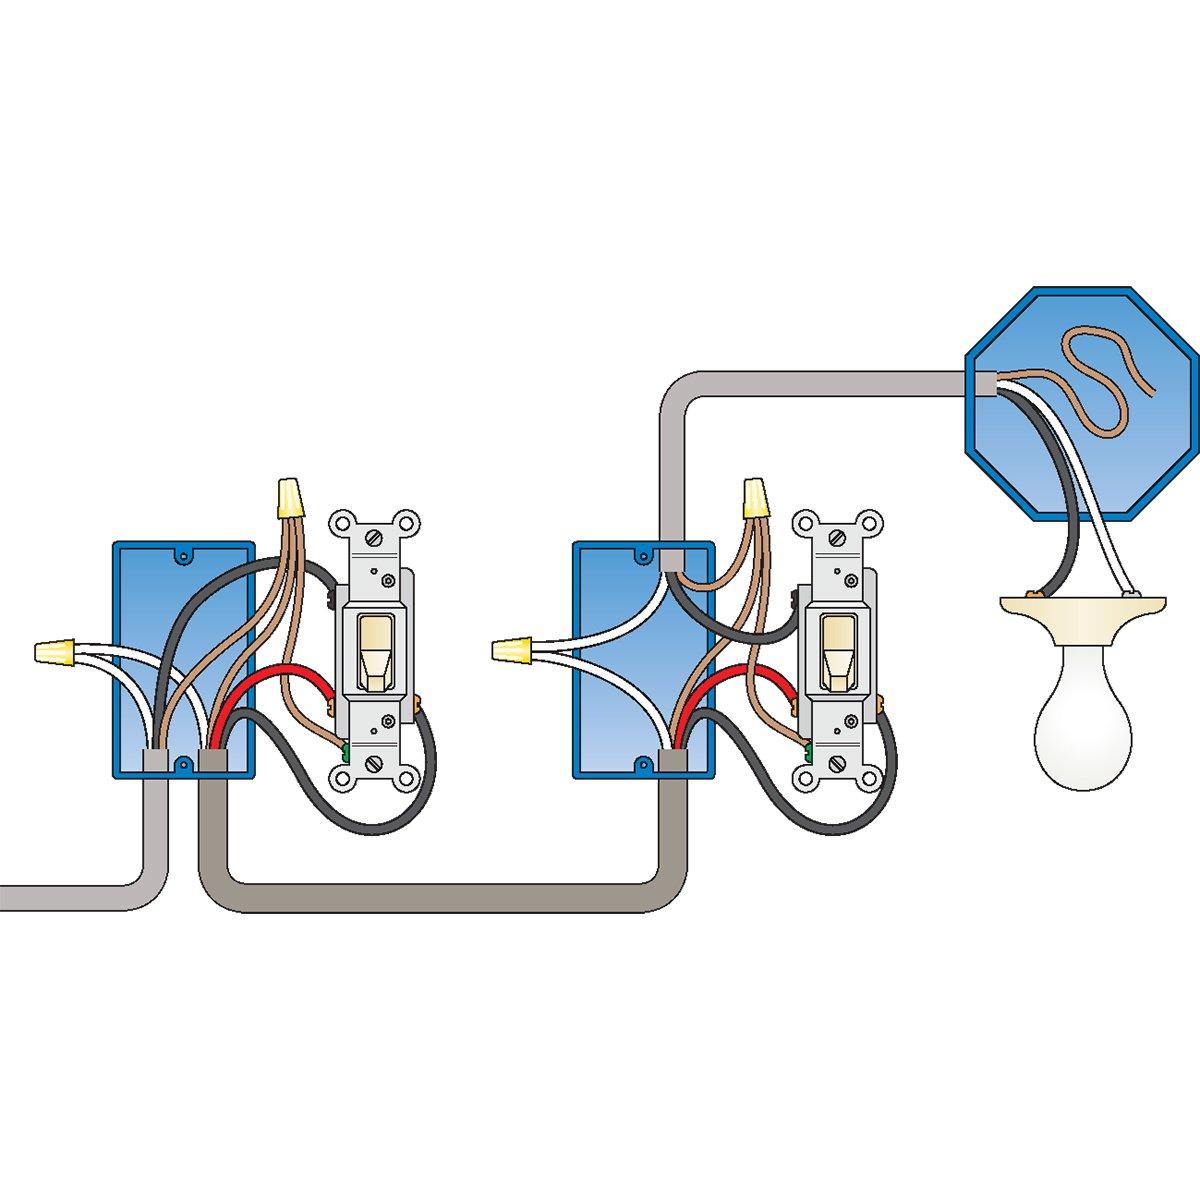 3 Way Wiring Diagram 3 Way Home Wiring Wiring Diagram Directory